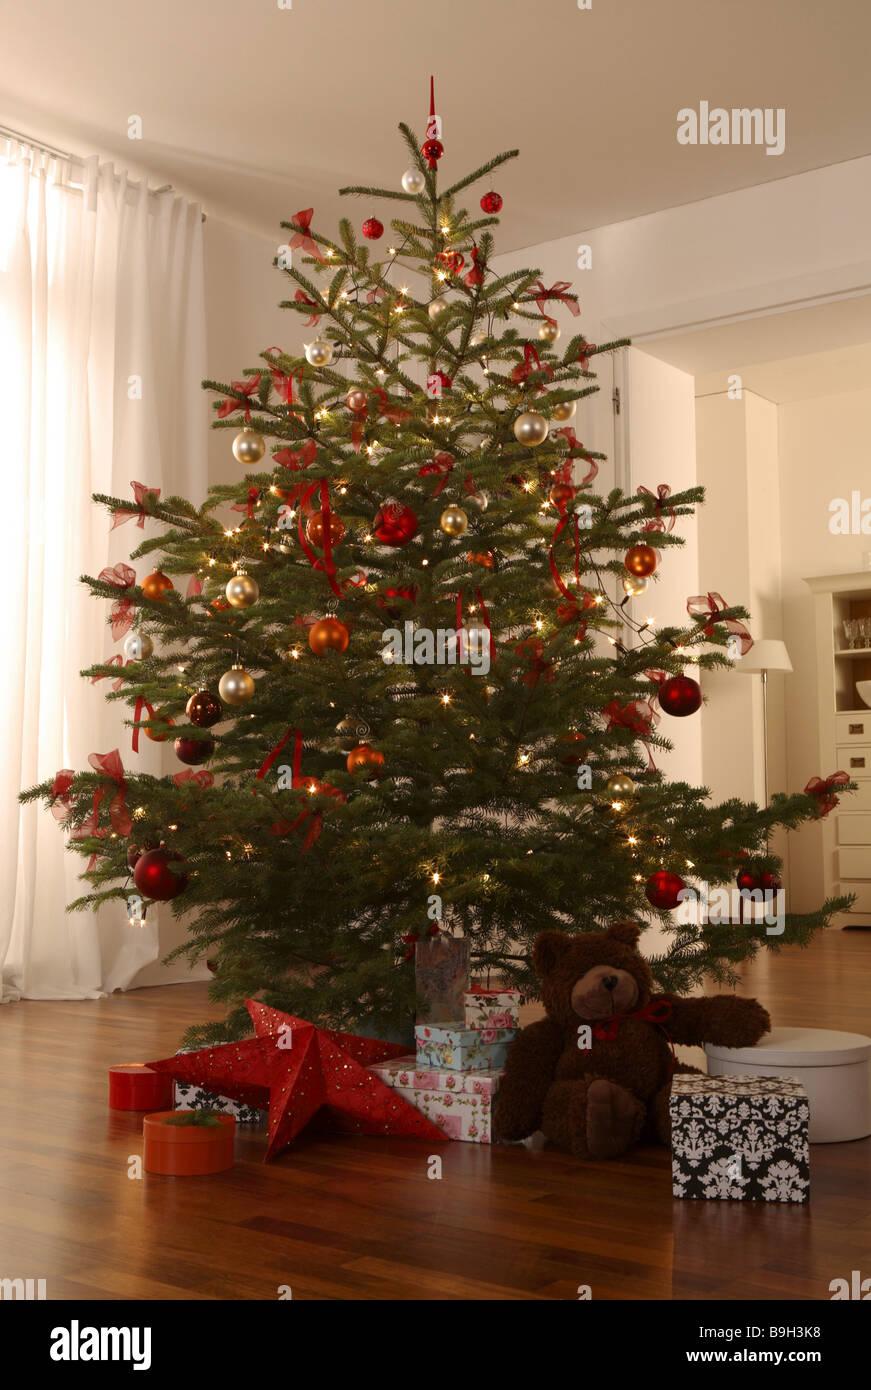 stock photo living room christmas tree gifts teddy bear illumination gift giving custom hood gifts decorated christmas eve wooden floor - Bear Christmas Tree